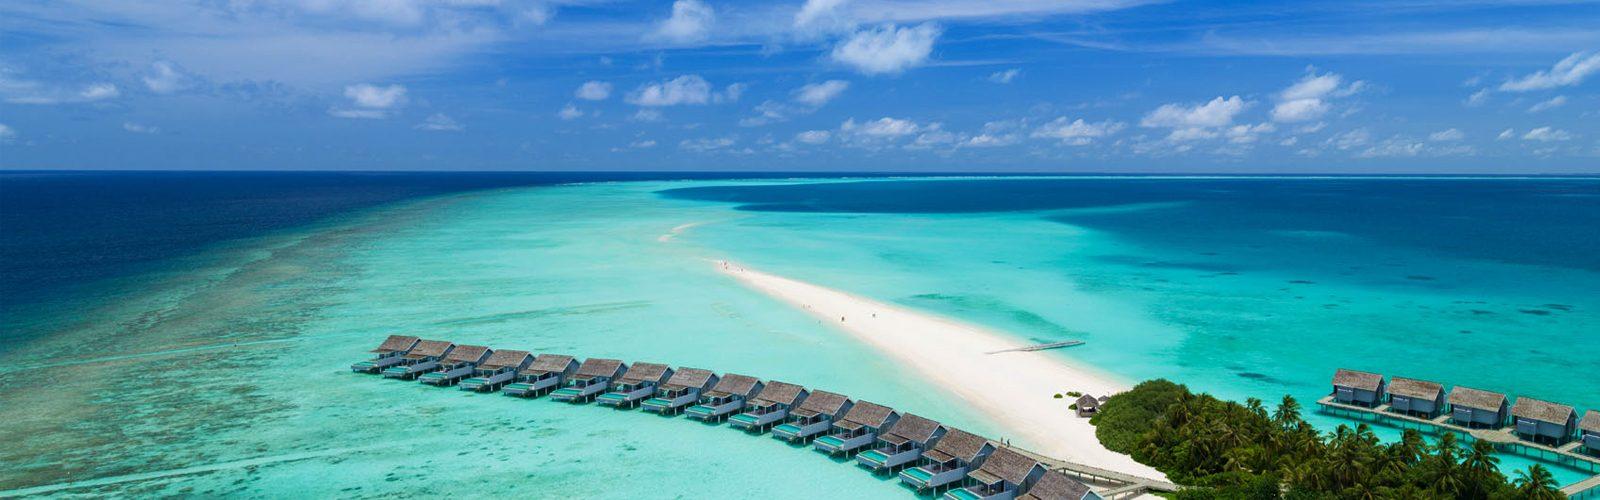 Kuramathi For Family Holidays Maldives Family Holiday Packages Header